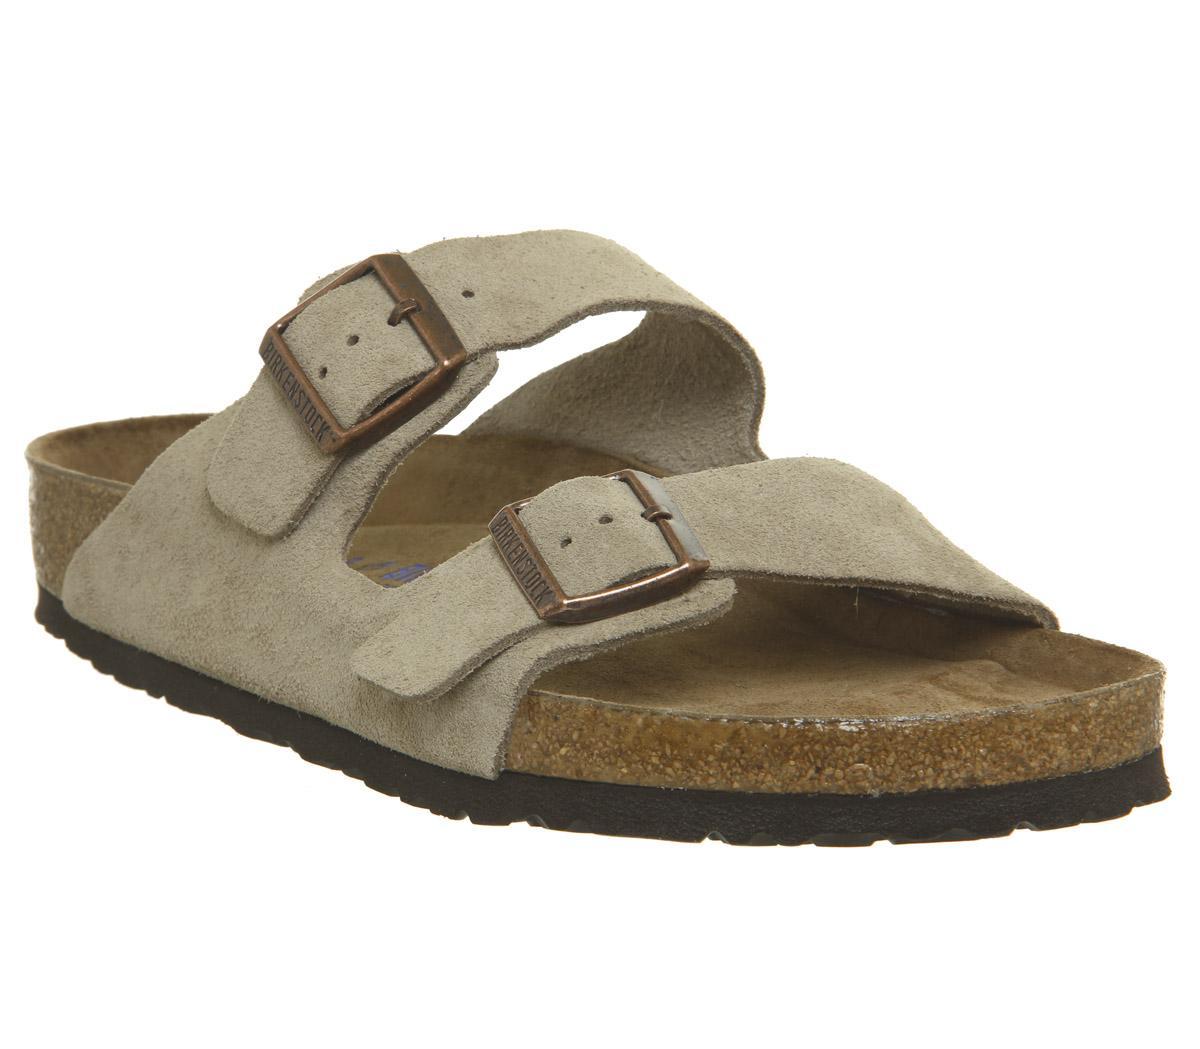 Arizona Two Strap Sandals